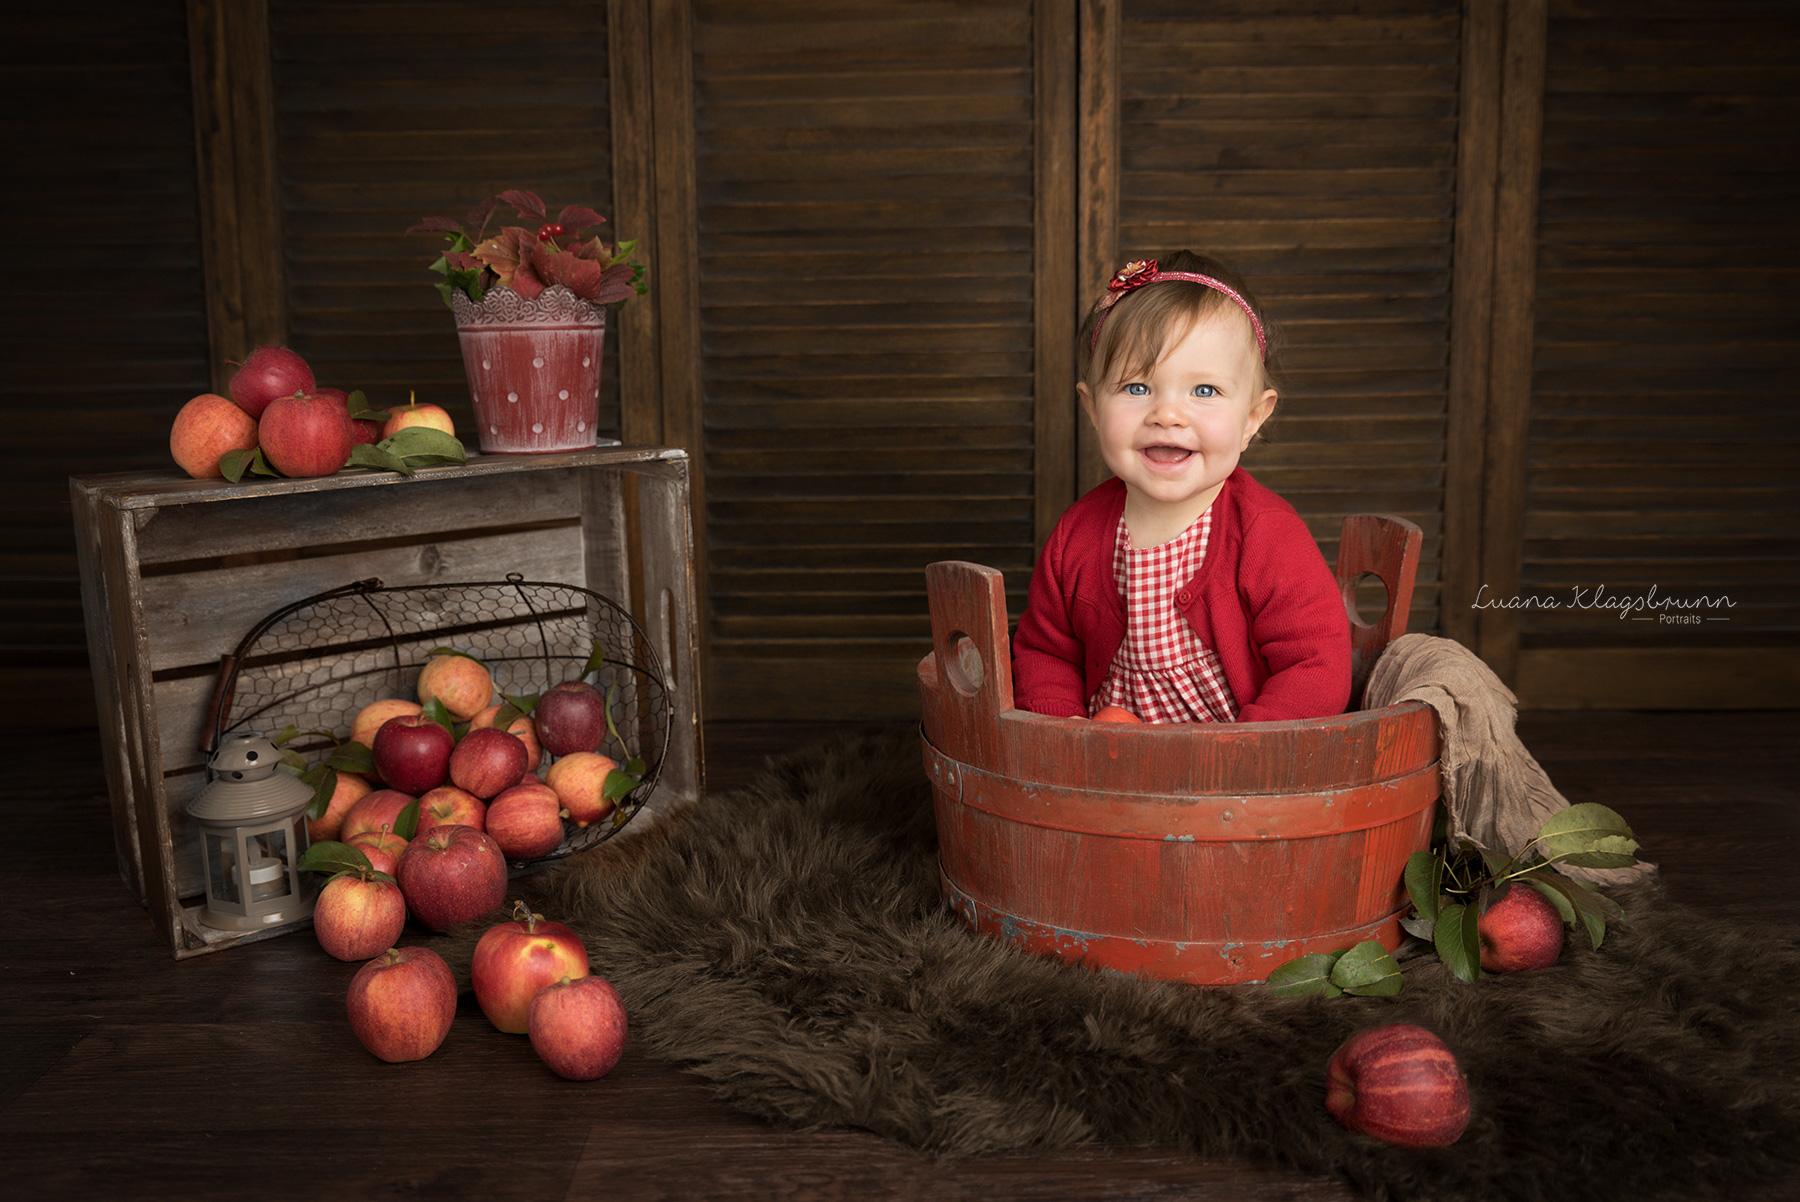 Kinderfotograf Karlsruhe Luana Klagsbrunn 4.jpg